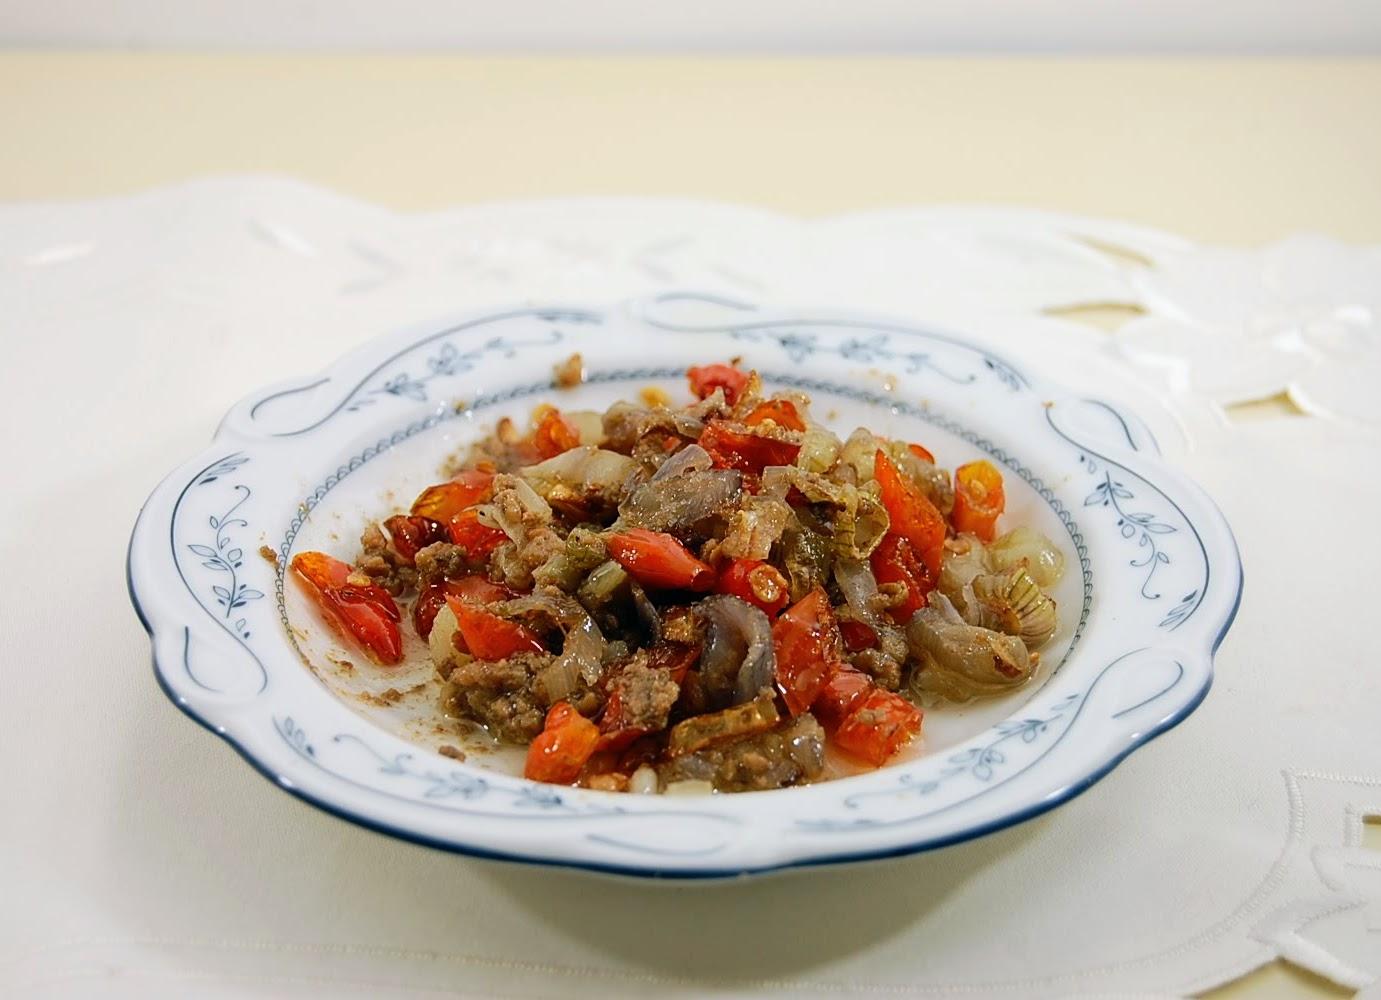 Rezept Balinesisch Sambal Oelek mit Garnelenpaste (Sambal Embeh)